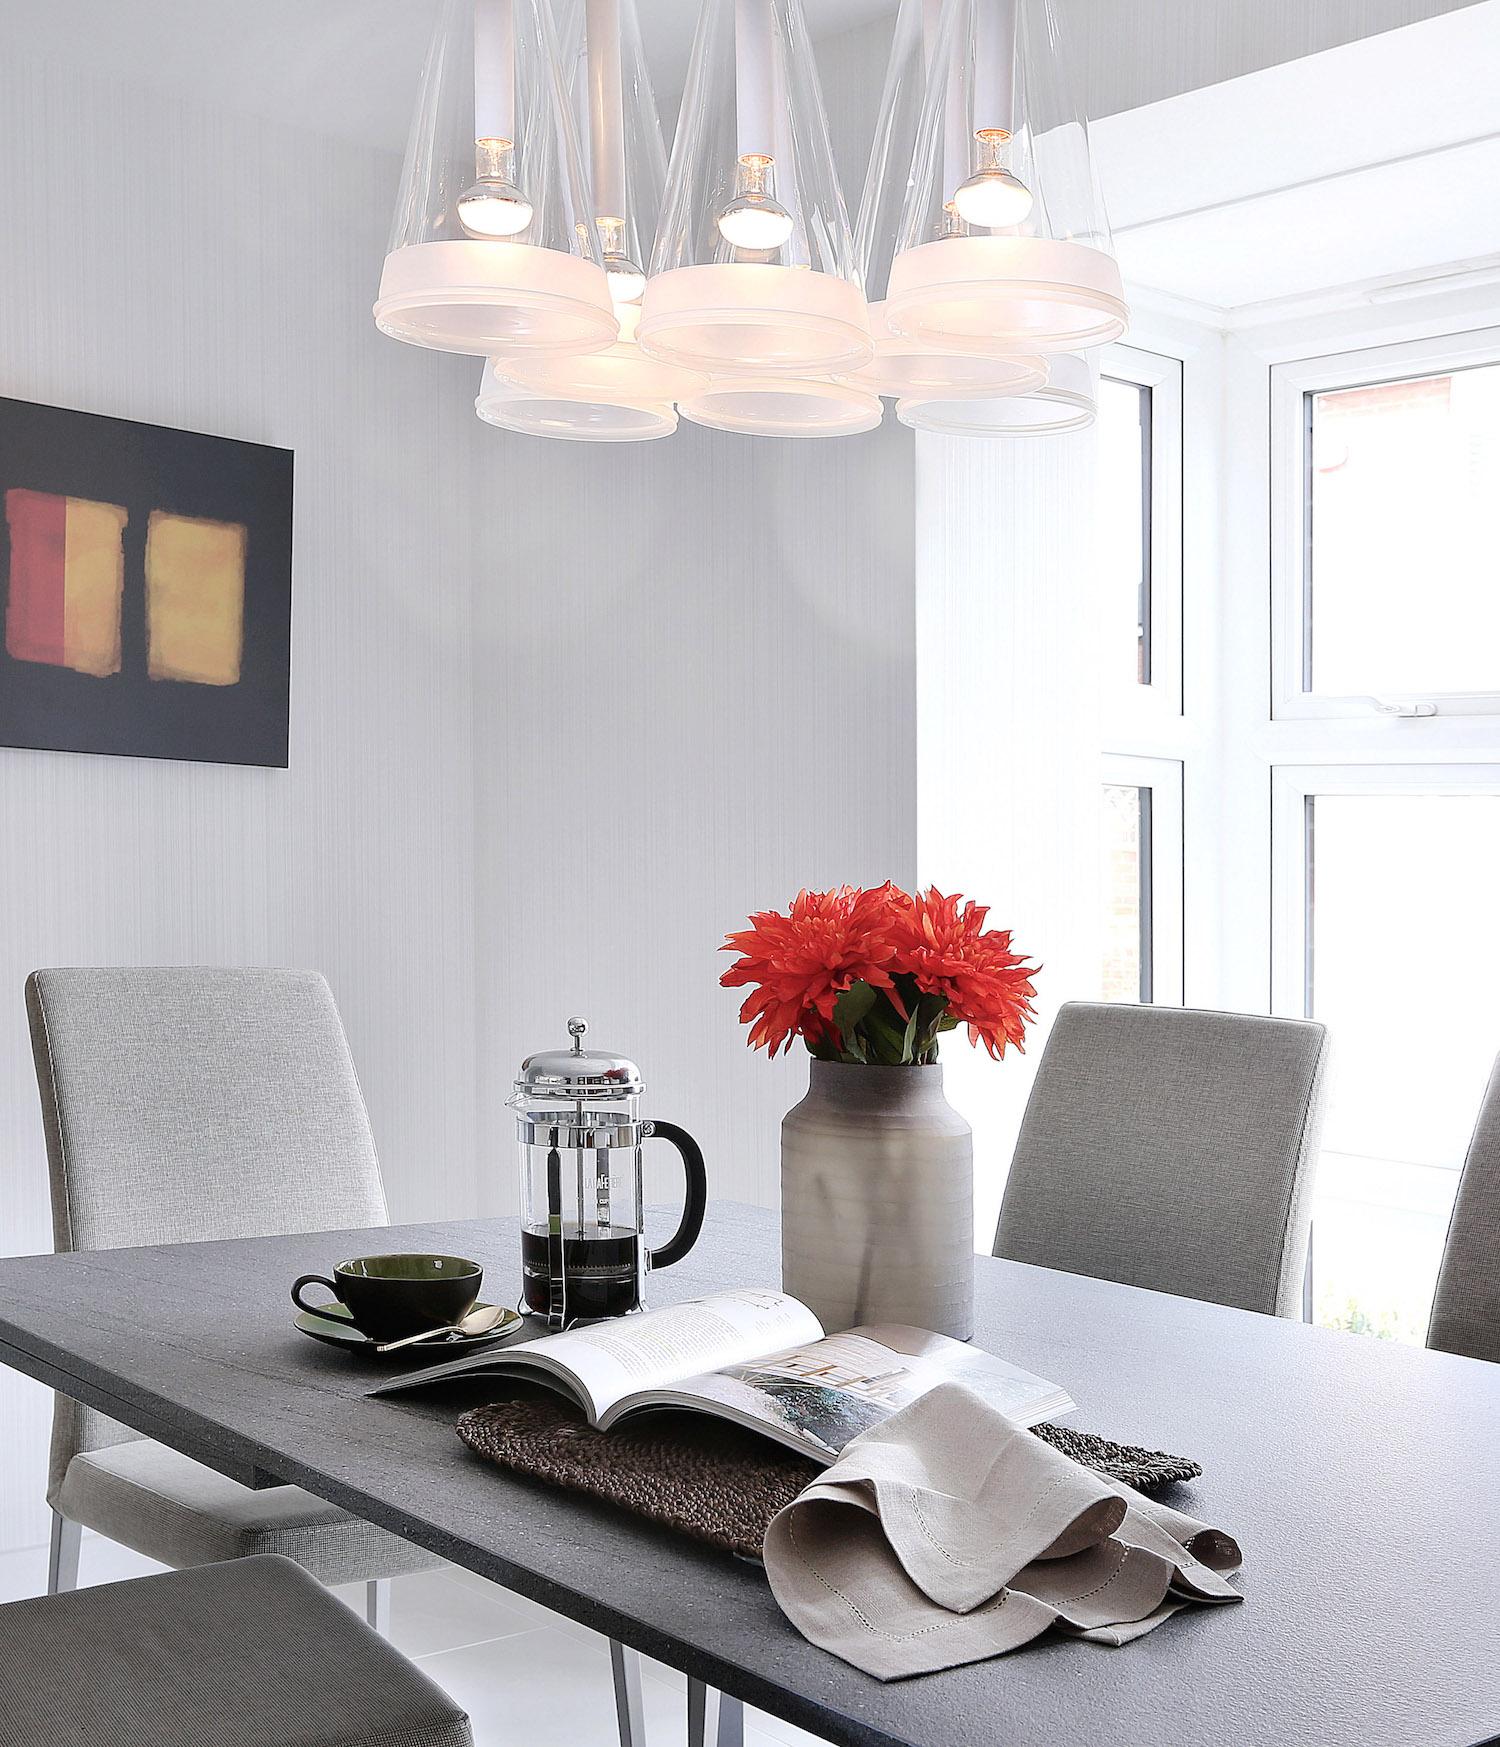 Modern Look but Practical Butterton Family Home in Buckinghamshire by LLI Design-01